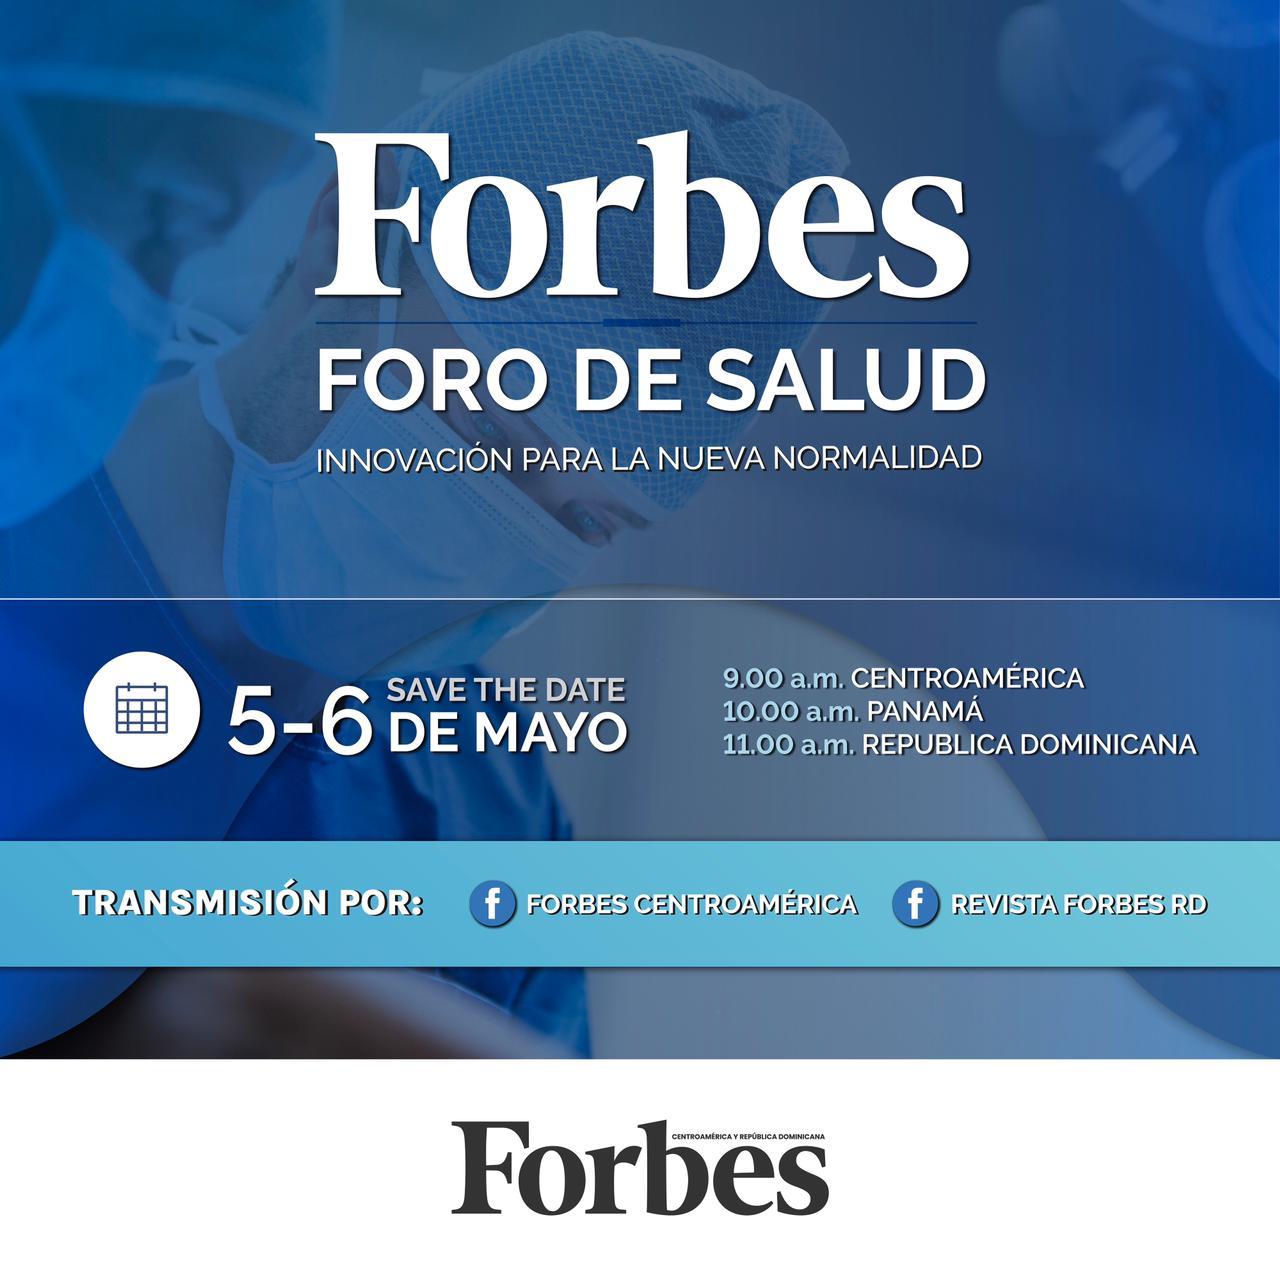 Forbes Foro de salud_20210421